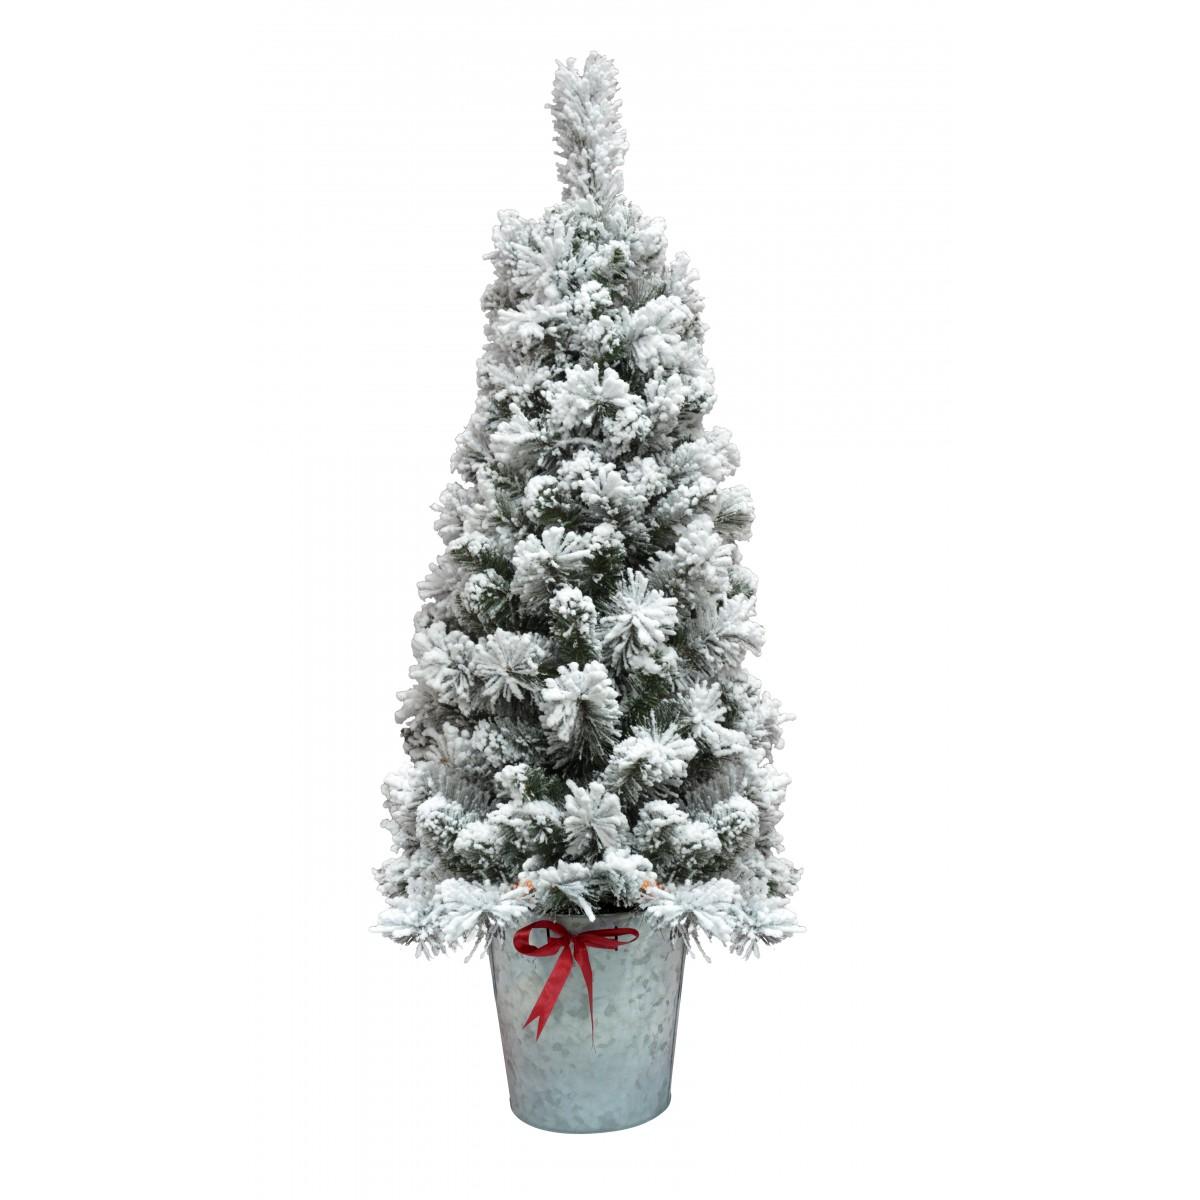 4ft Christmas Tree.4ft Flocked Pot Christmas Tree